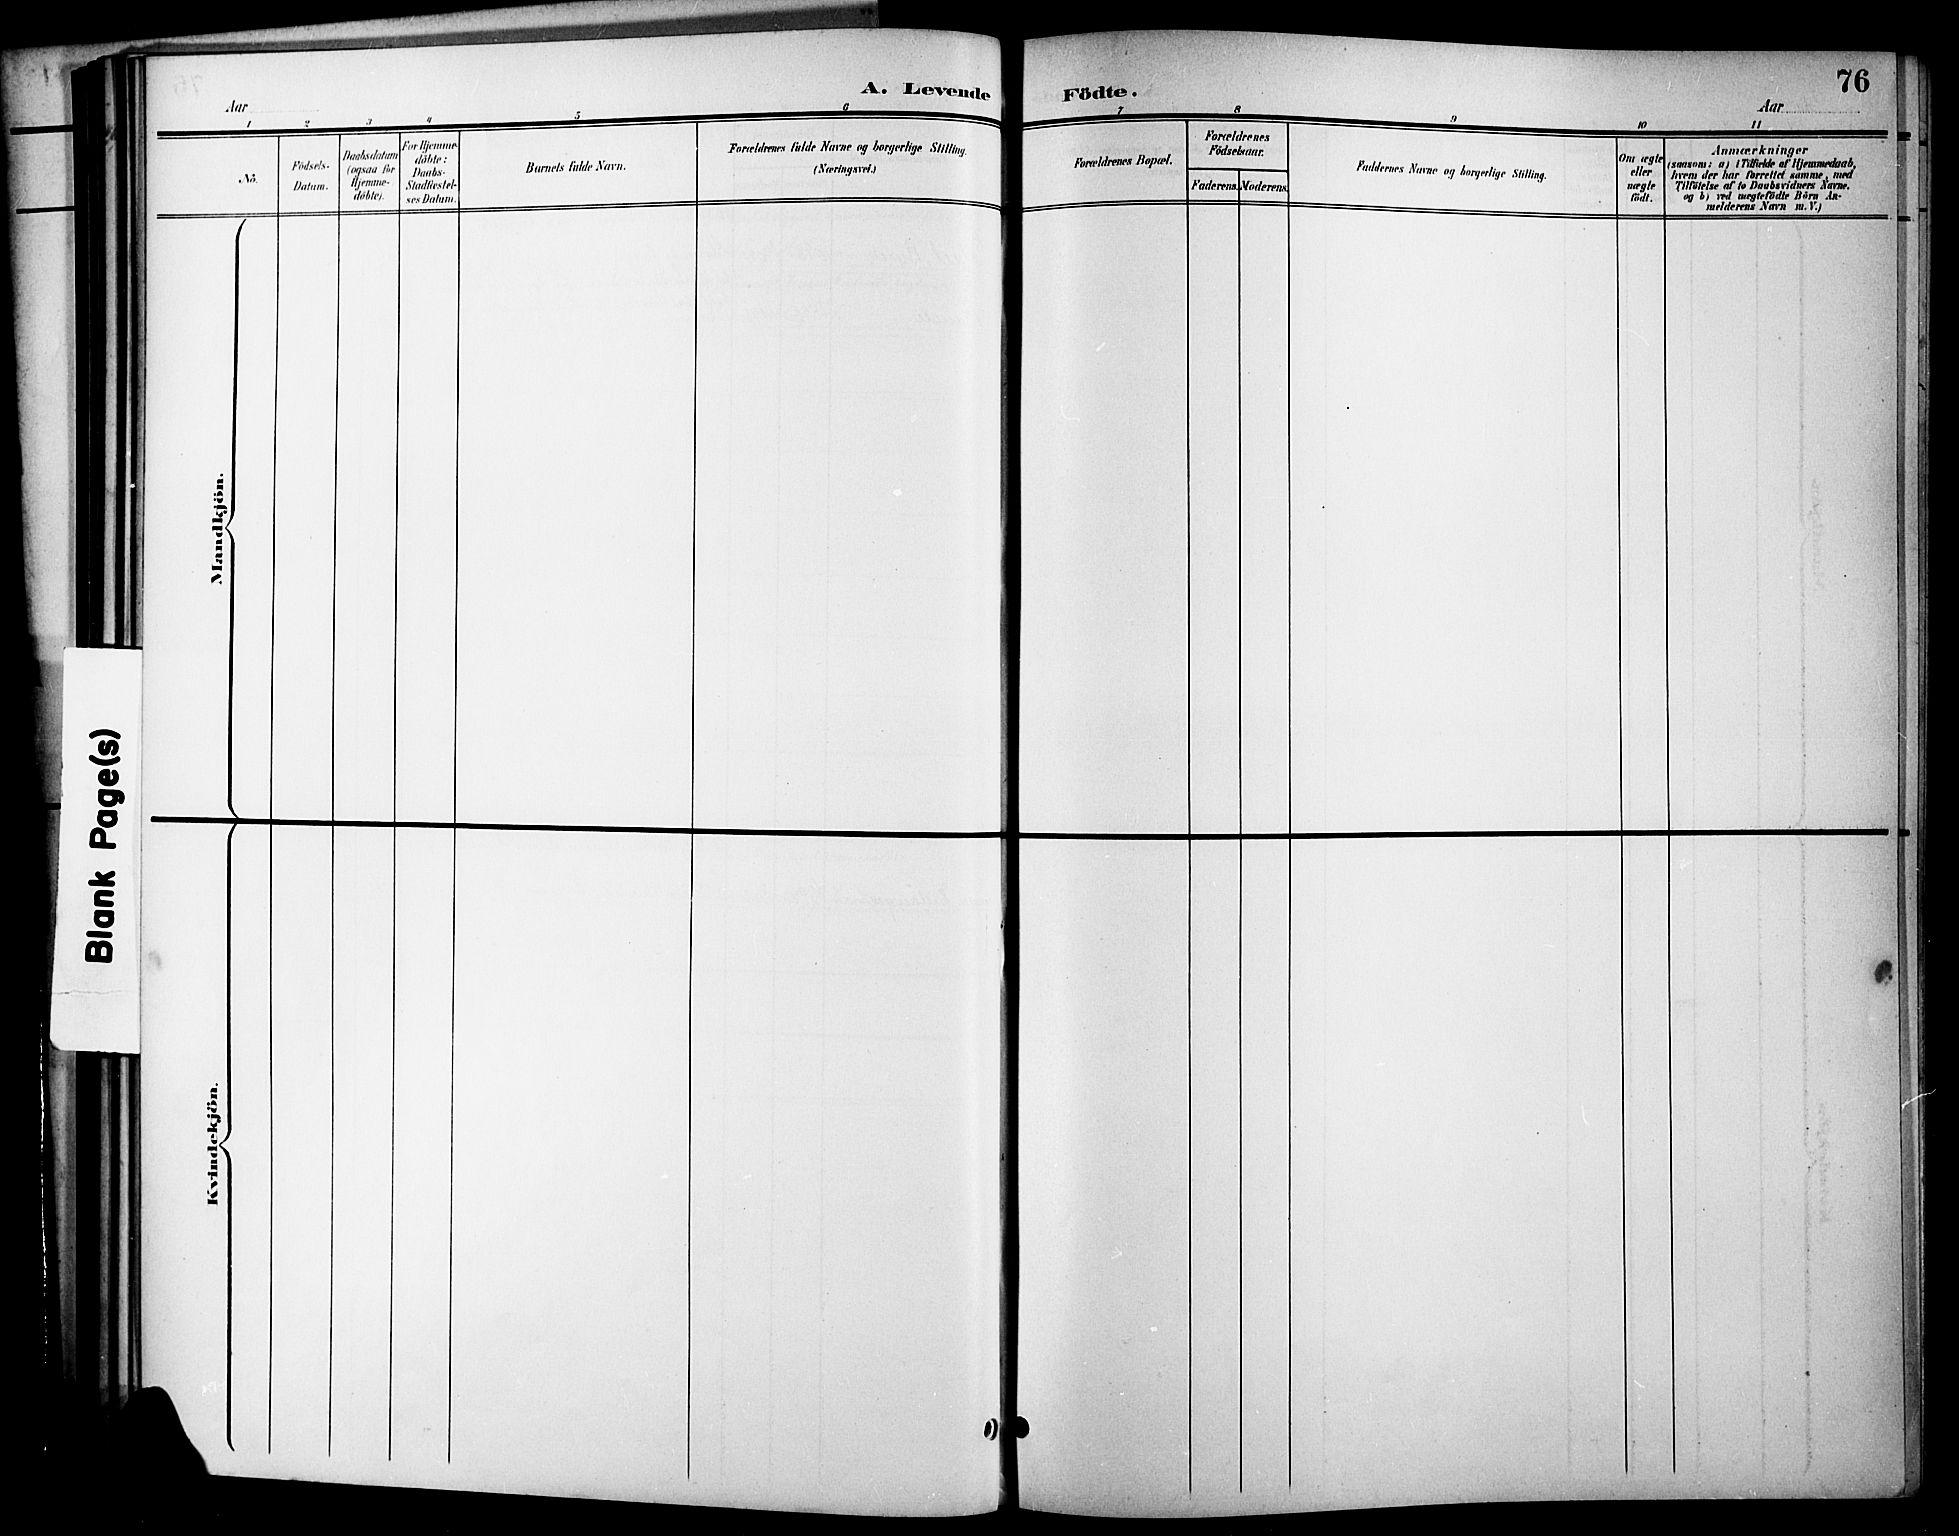 SAKO, Brevik kirkebøker, G/Ga/L0005: Klokkerbok nr. 5, 1901-1924, s. 76